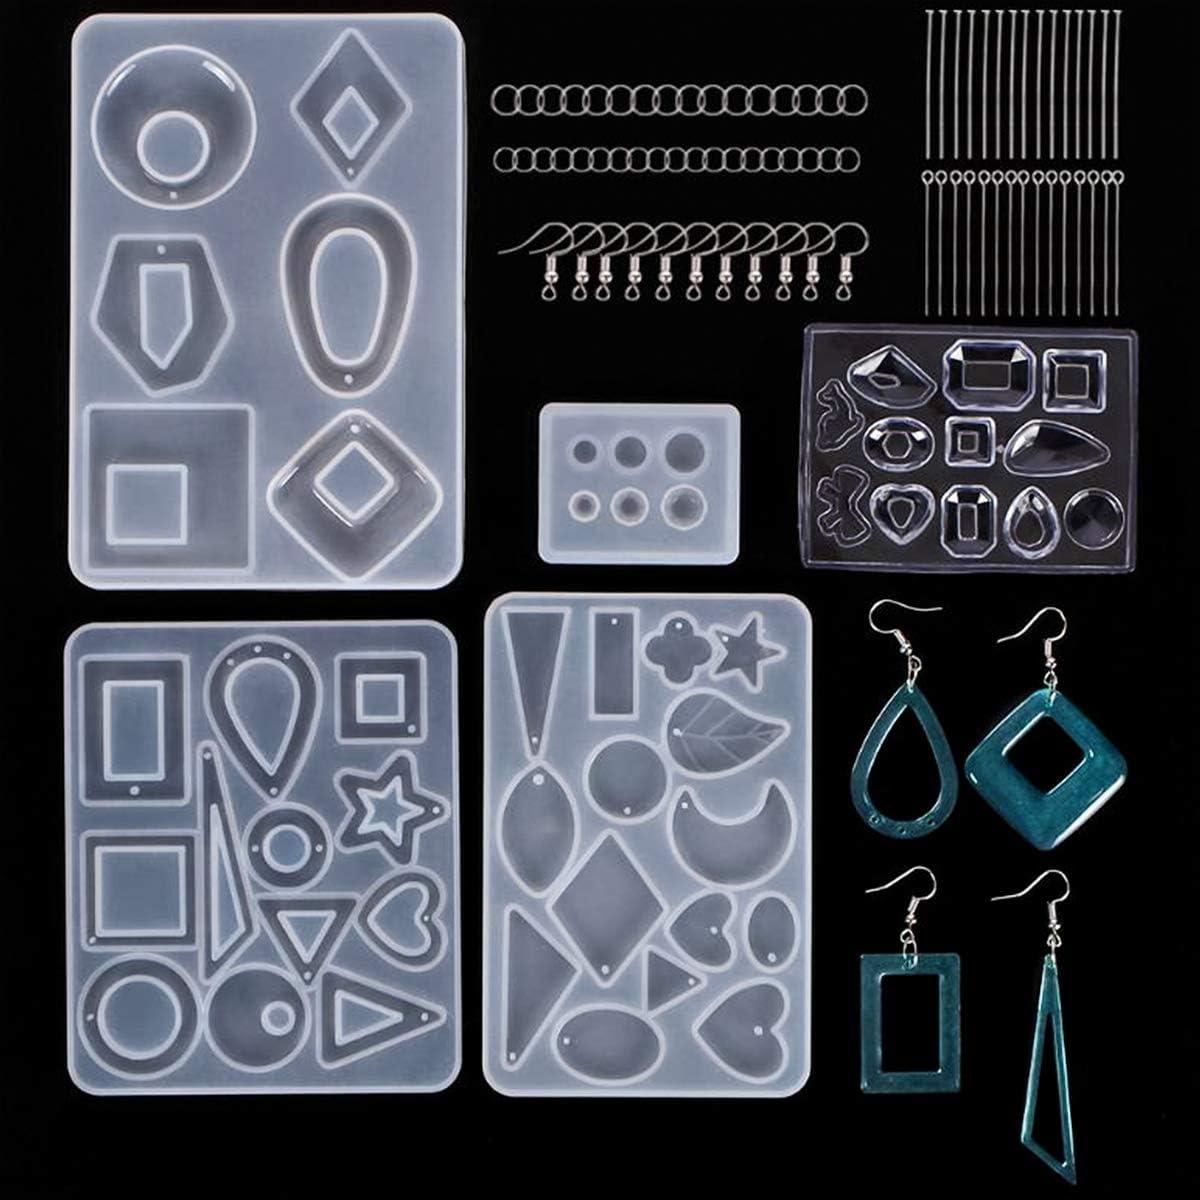 Silikon Ohrring Anhänger Schmuck Form Harz Gussform Werkzeug DIY Epoxy MakingW2I